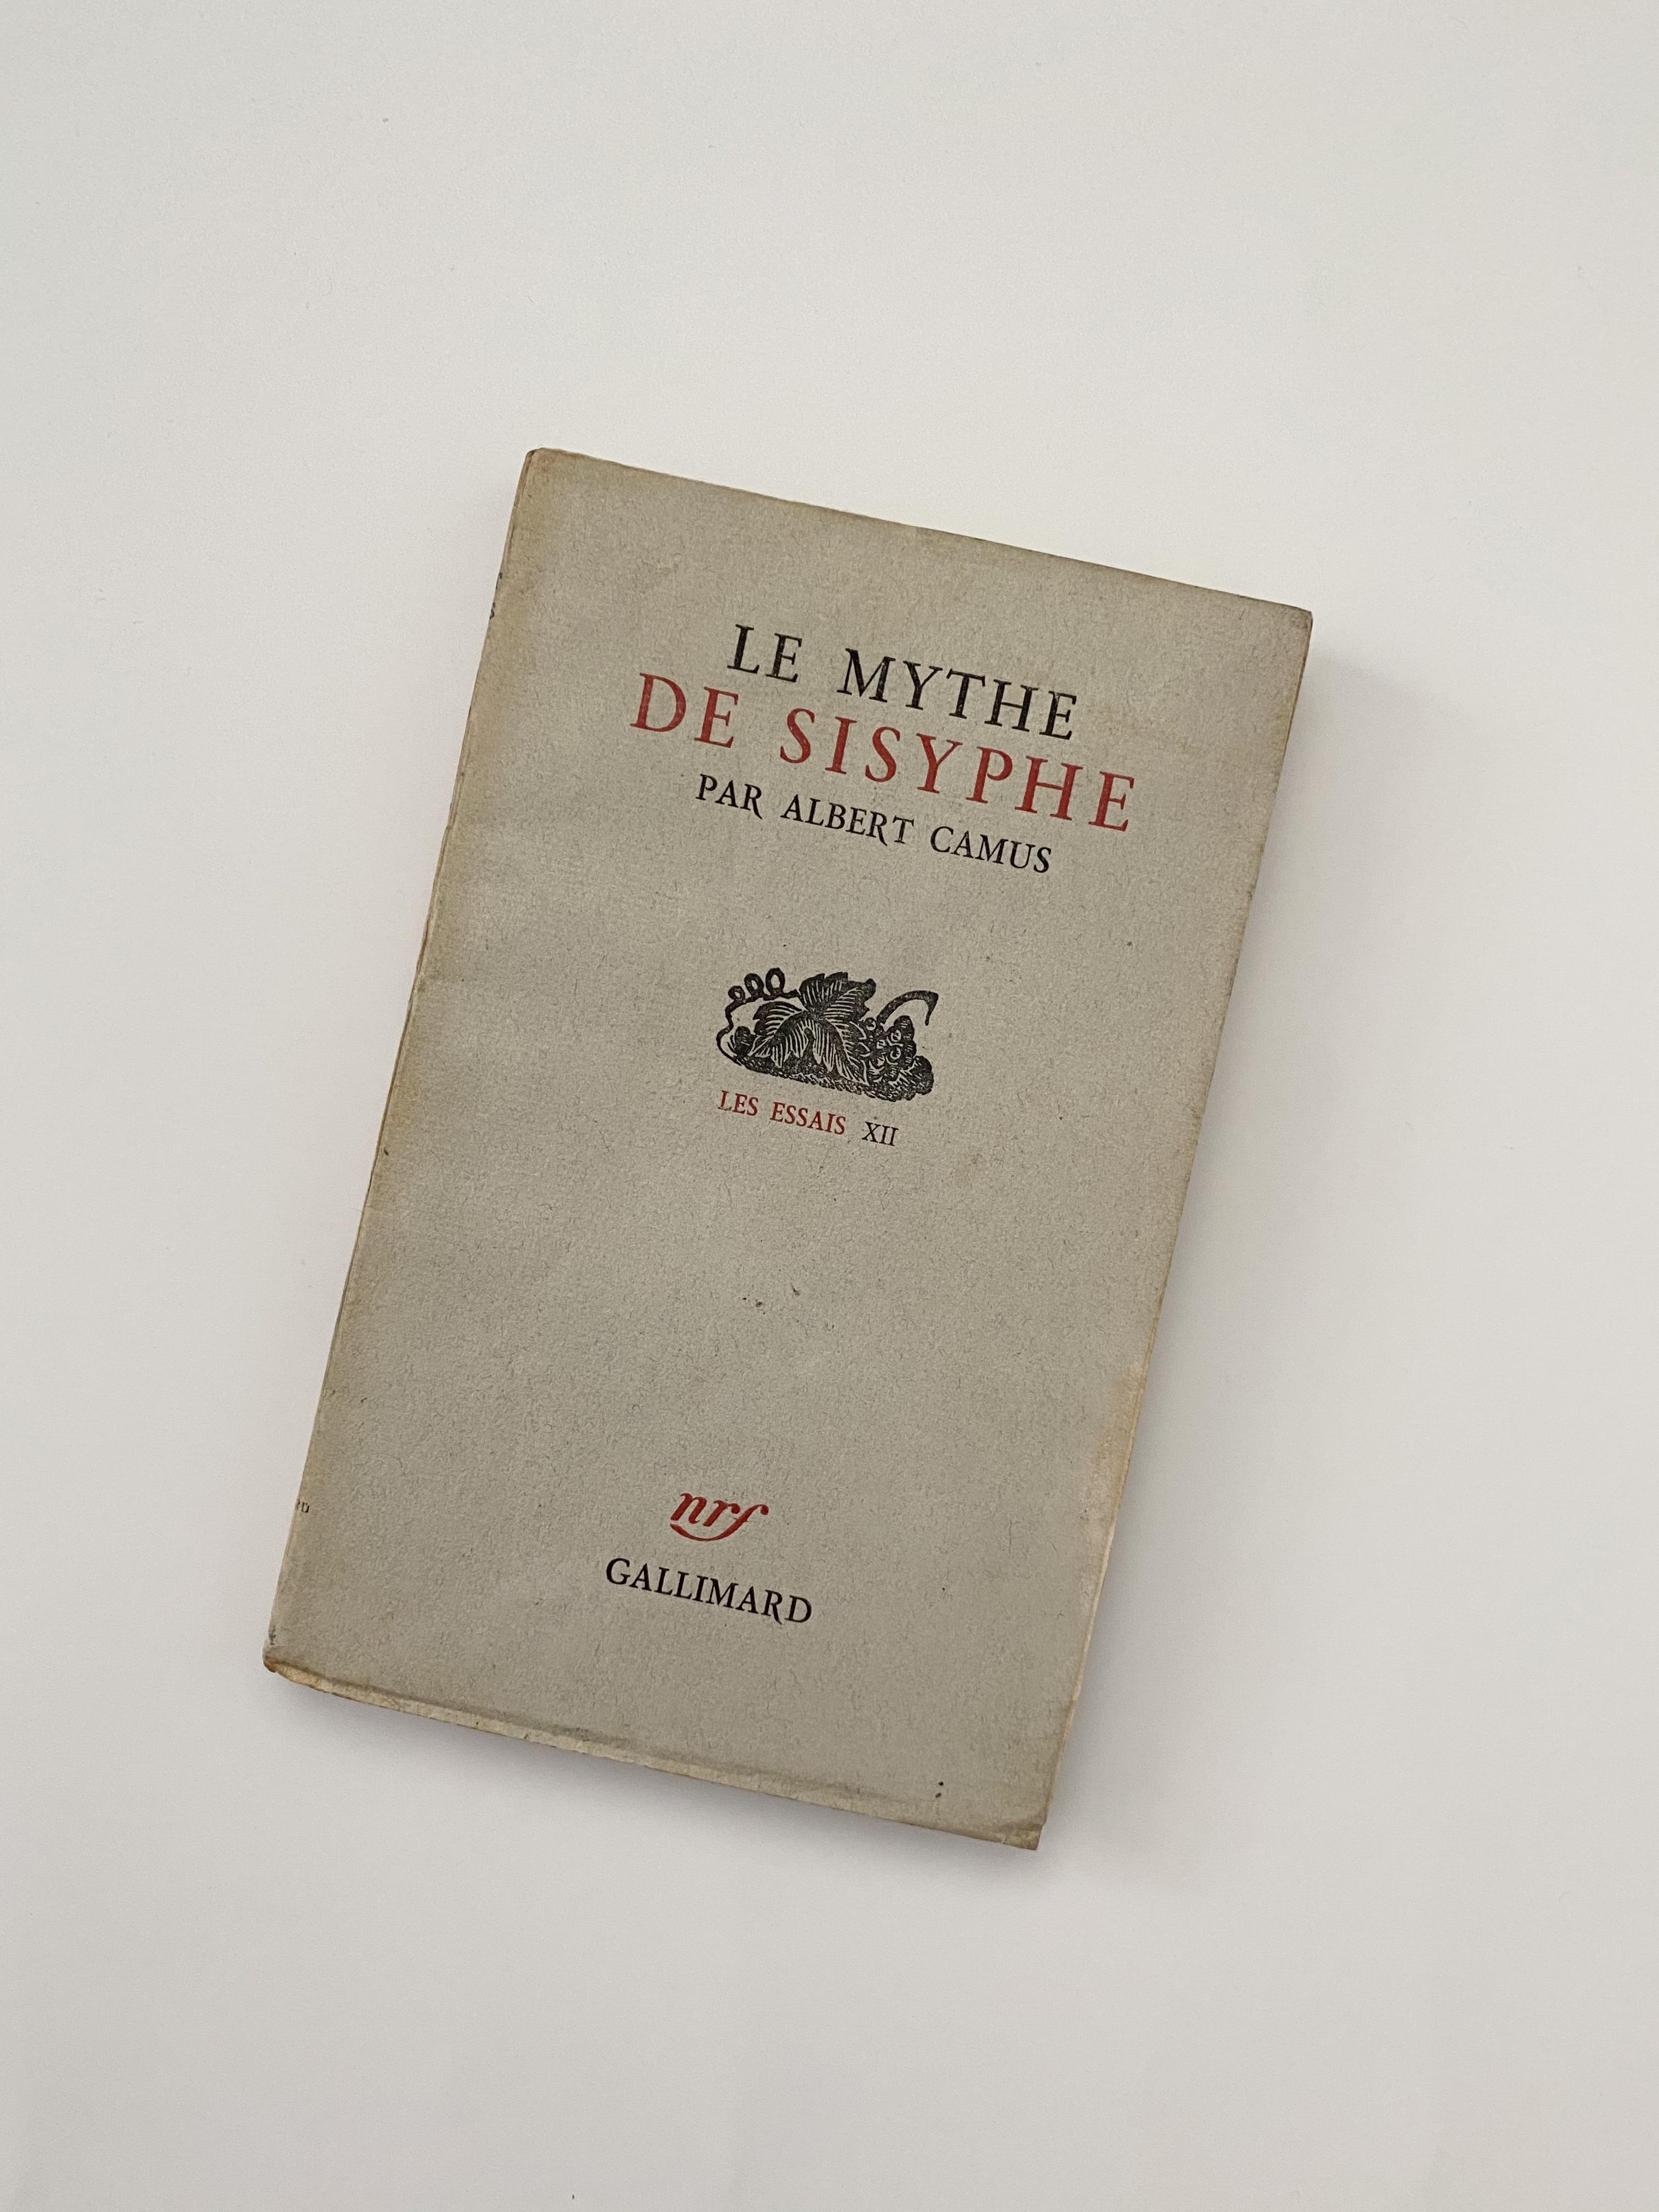 Sissyphus myth of Camus's The